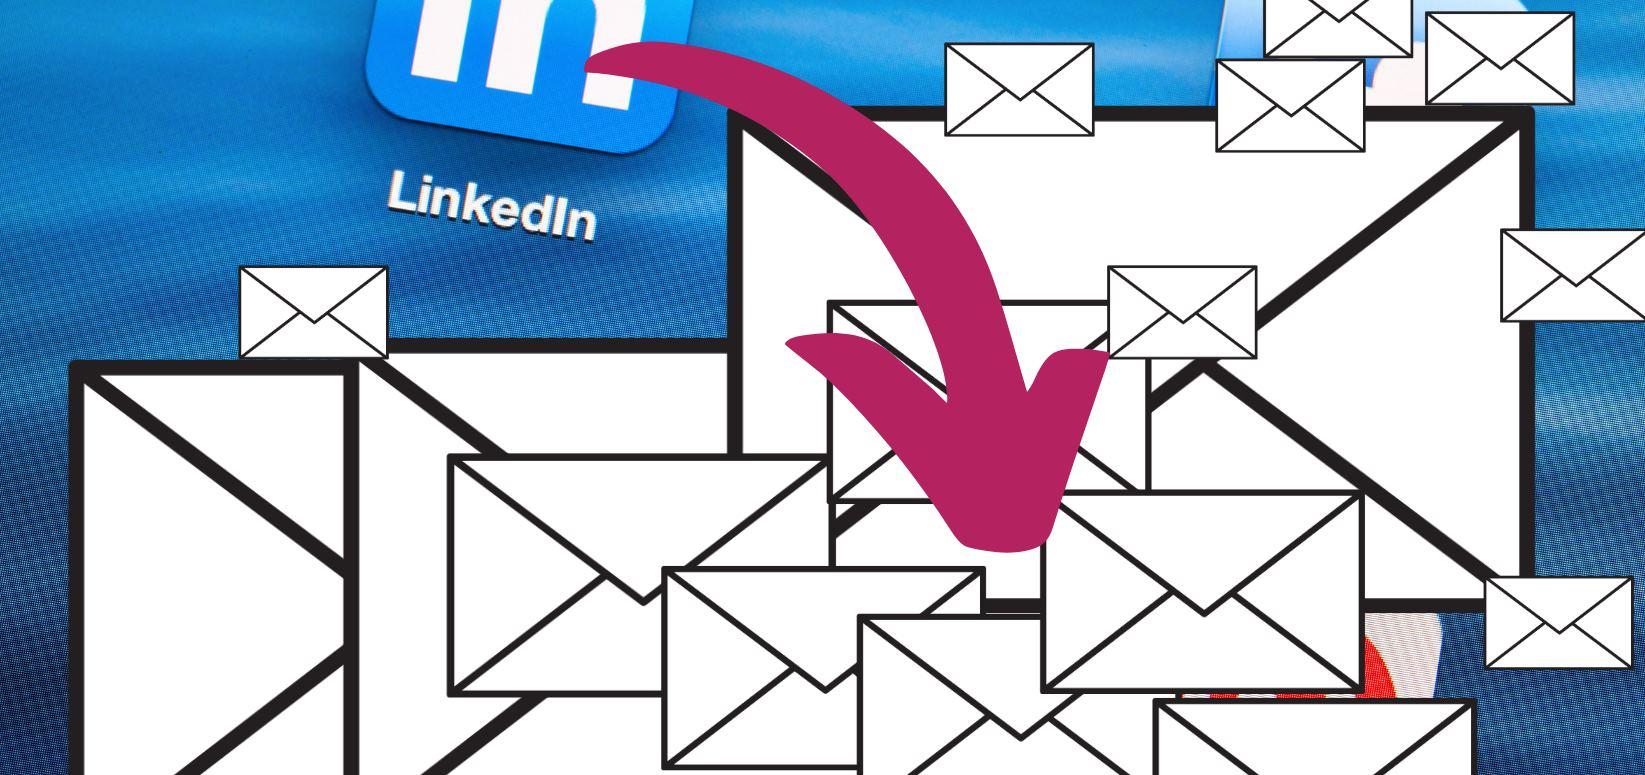 Siguen apareciendo opciones para extraer emails de Linkedin